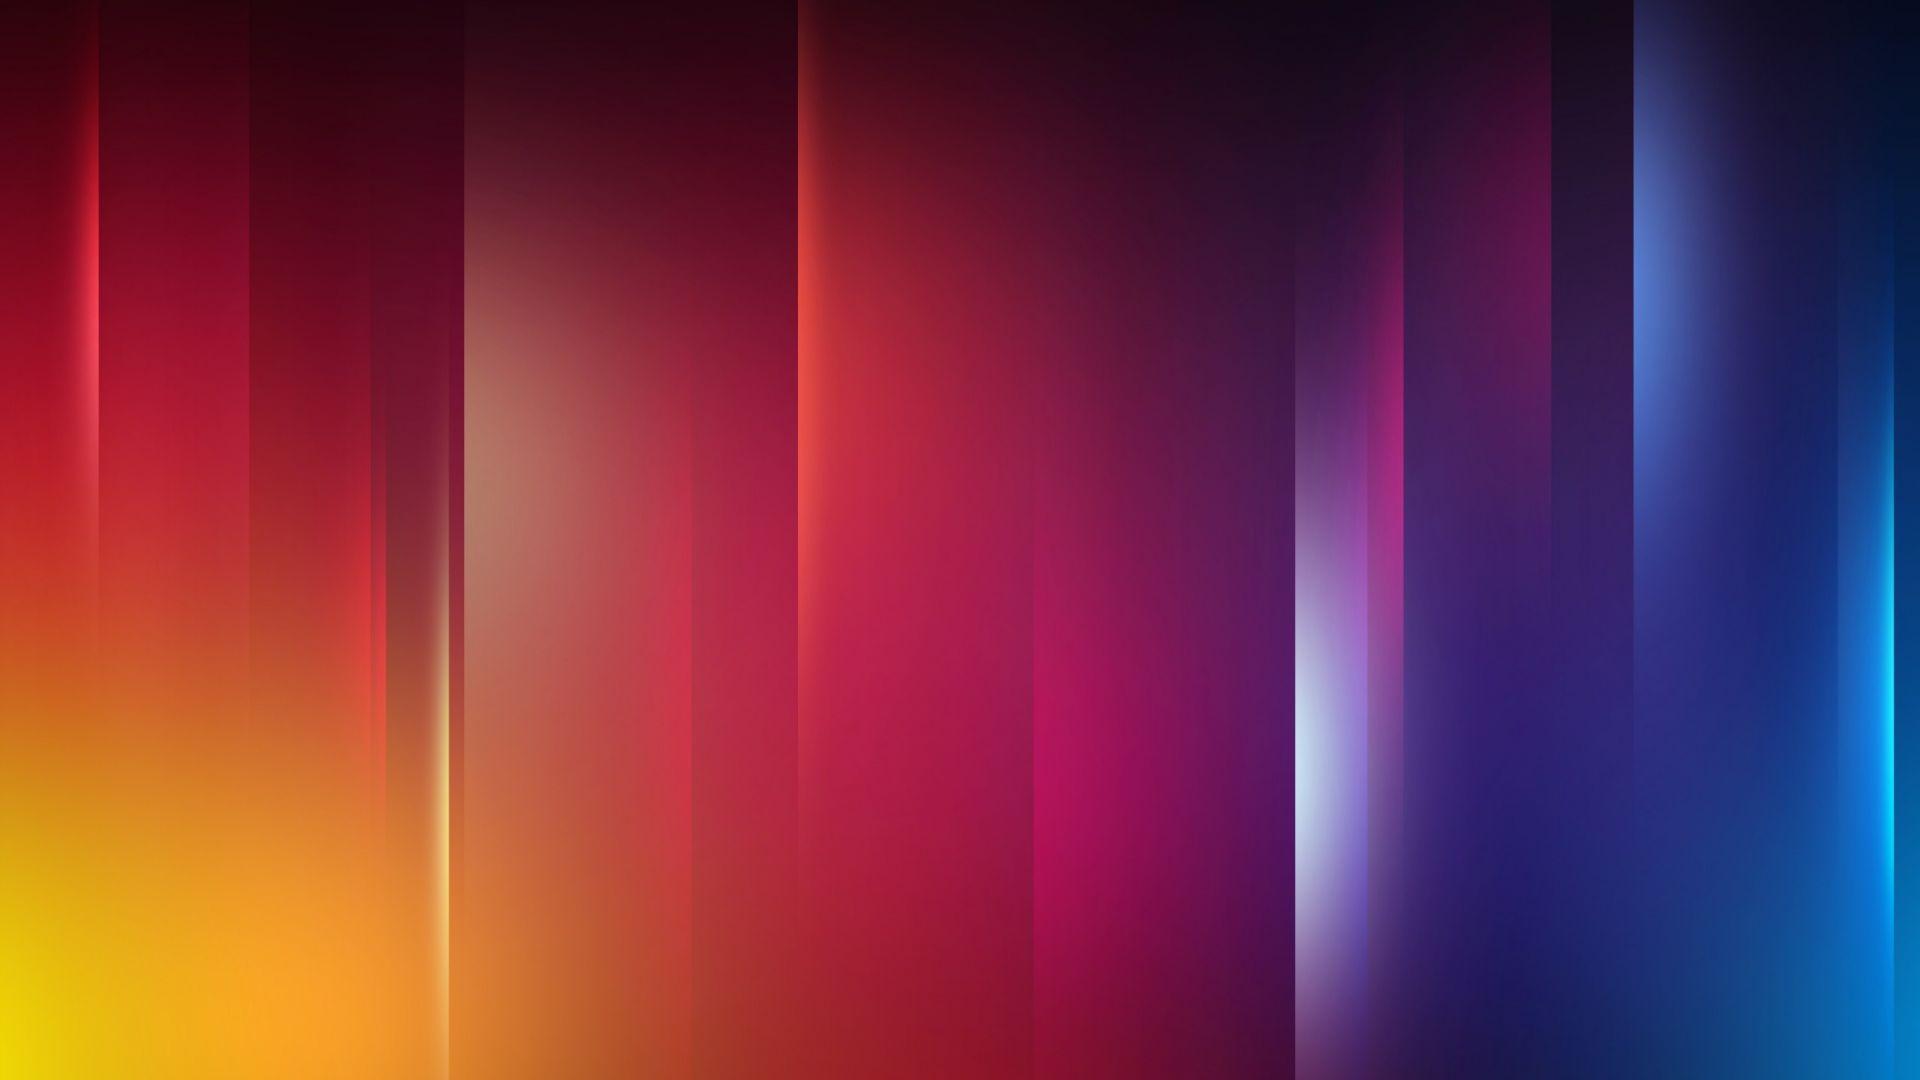 Abstract, digital artwork, straight lines